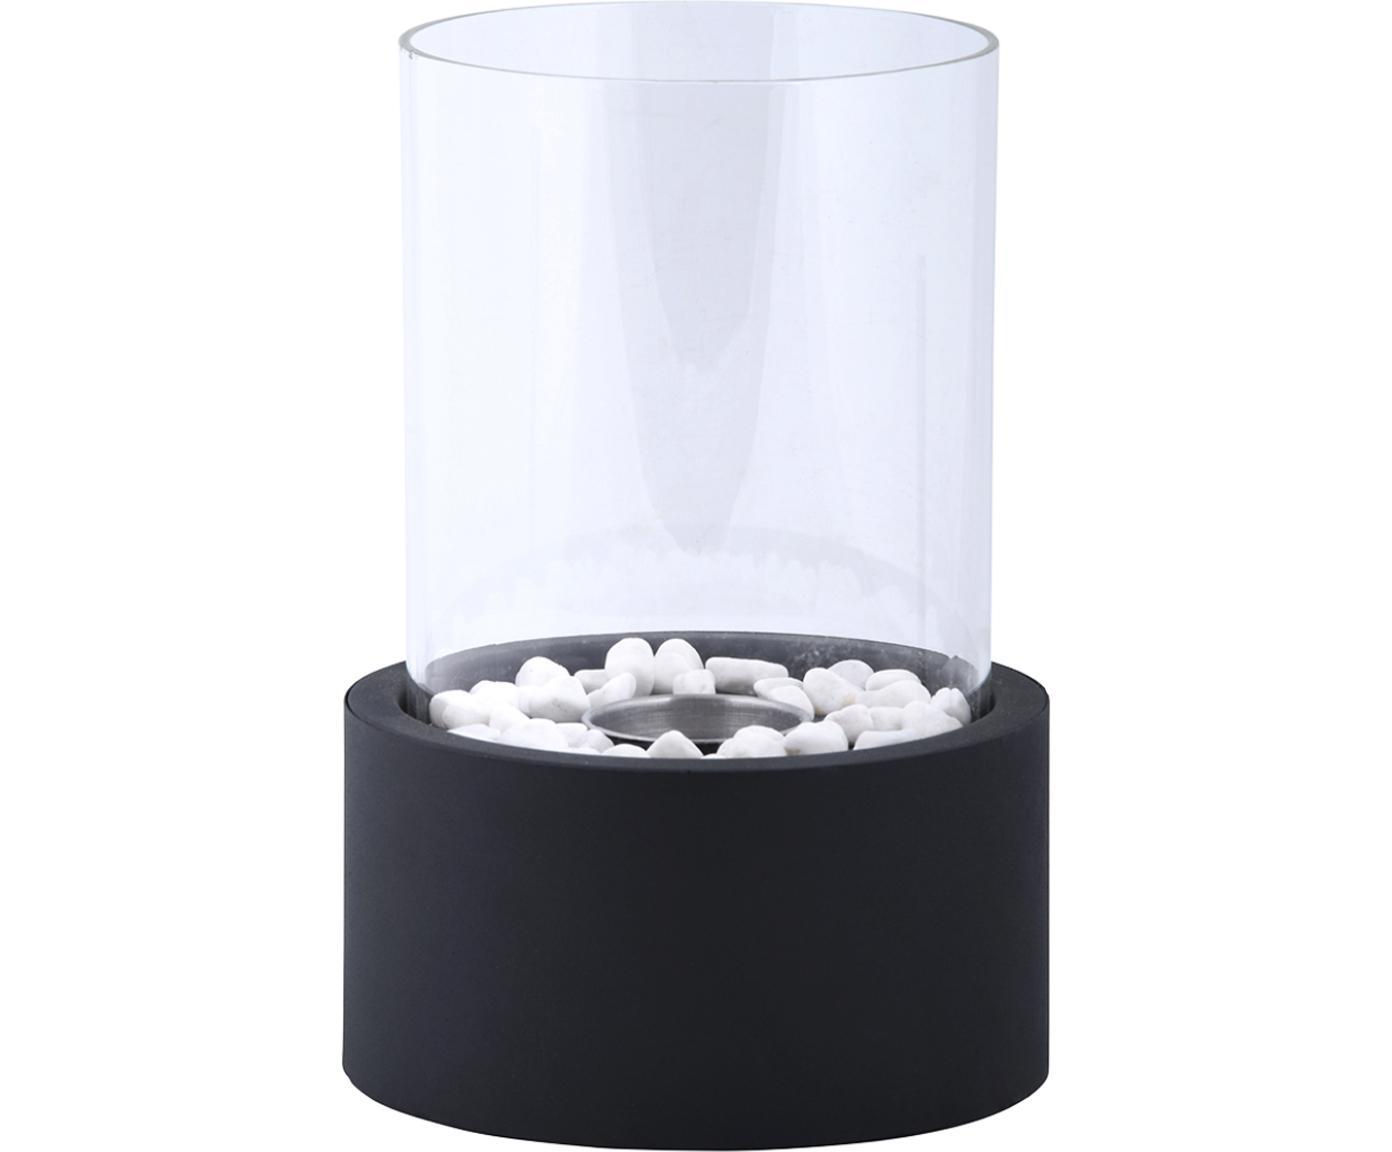 Bioethanolbrander Damin, Metaal, glas, Zwart, transparant, Ø 19 x H 27 cm